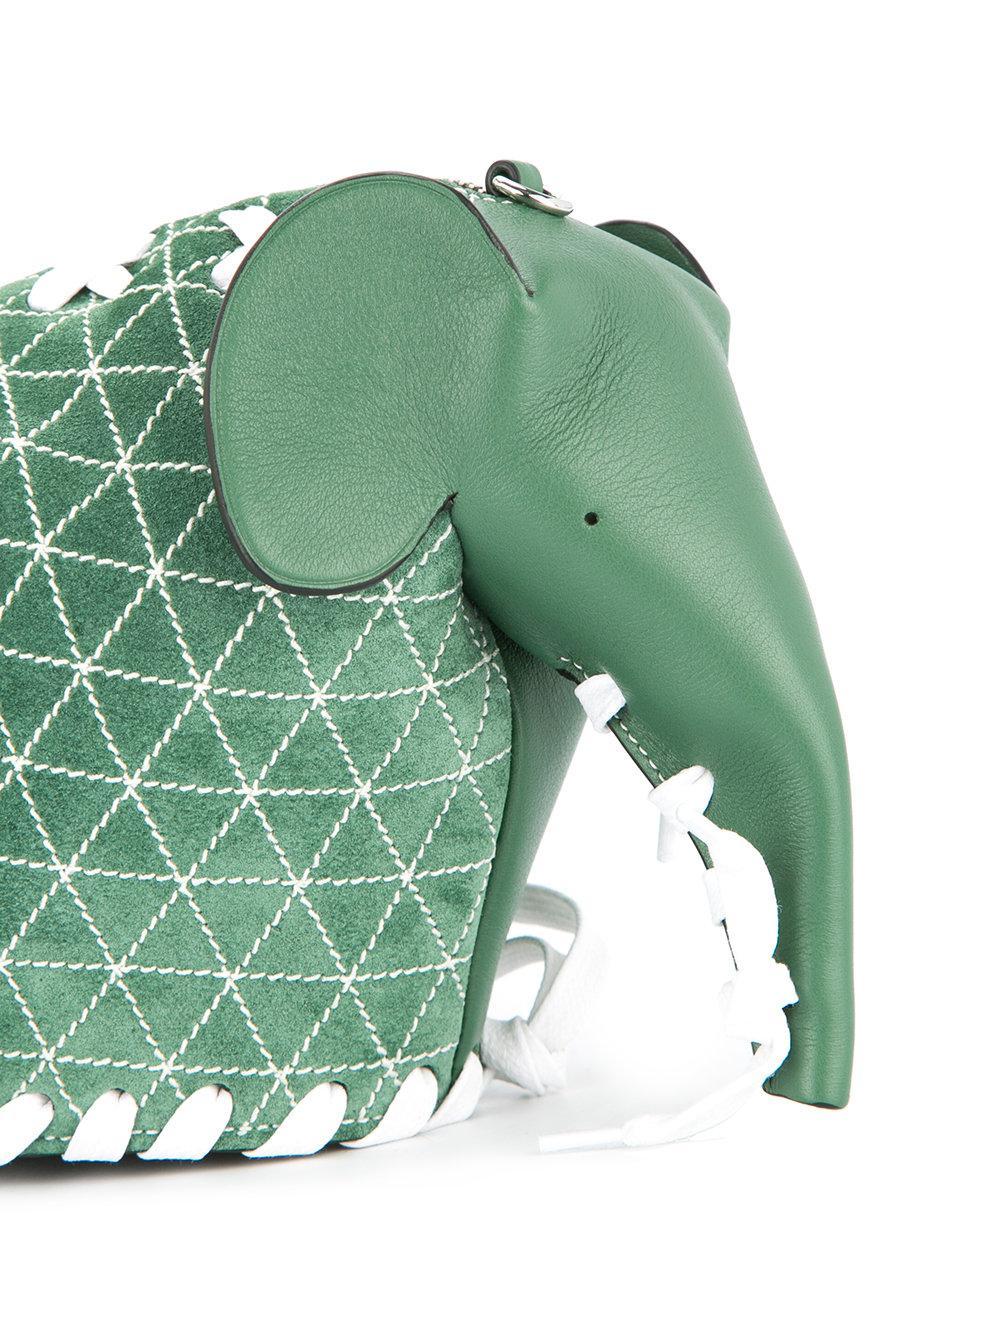 Loewe Leather Elephant Crossbody Bag in Green